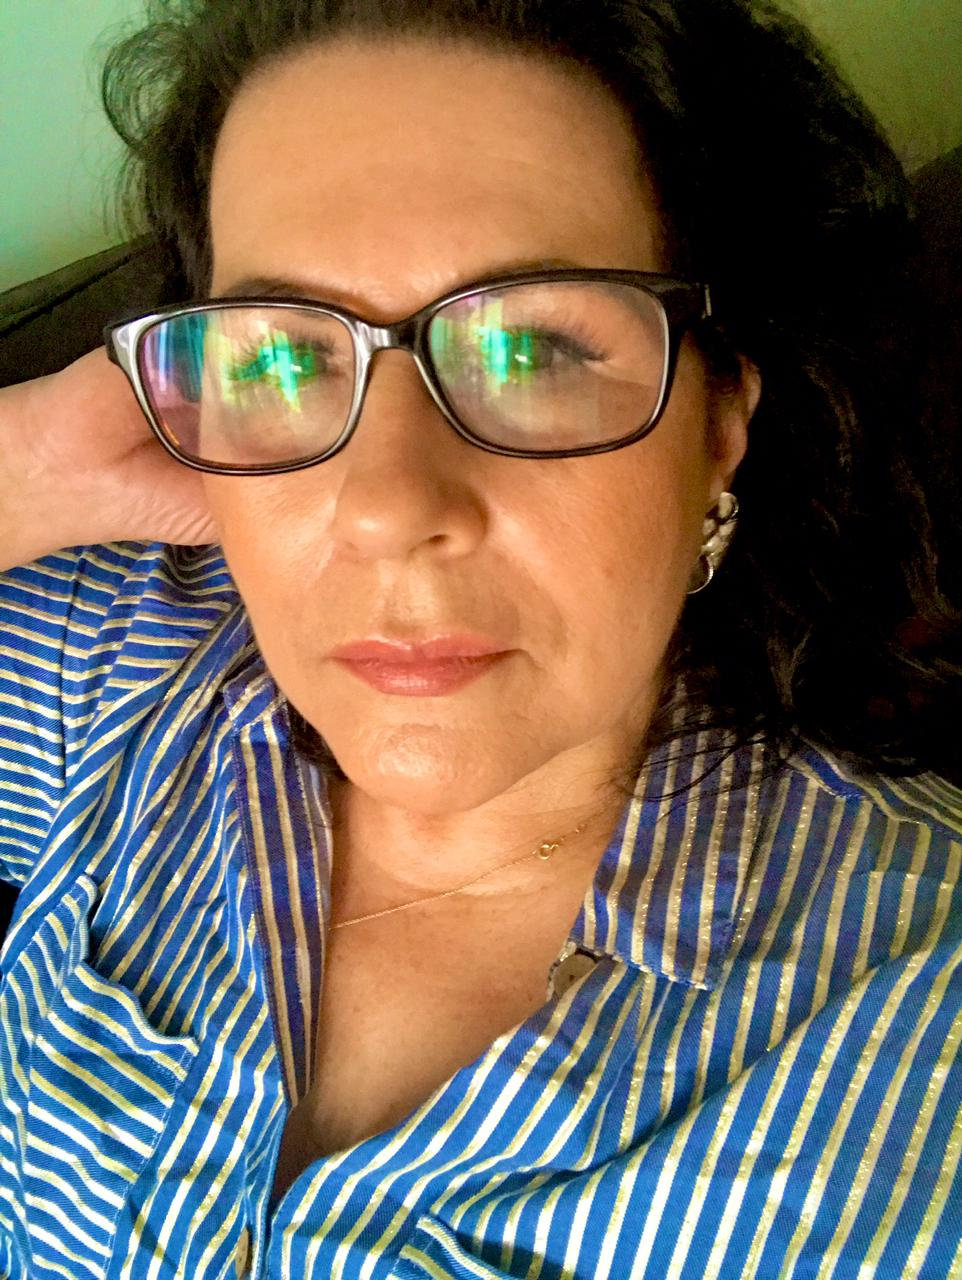 Sirlei Alves Camargo